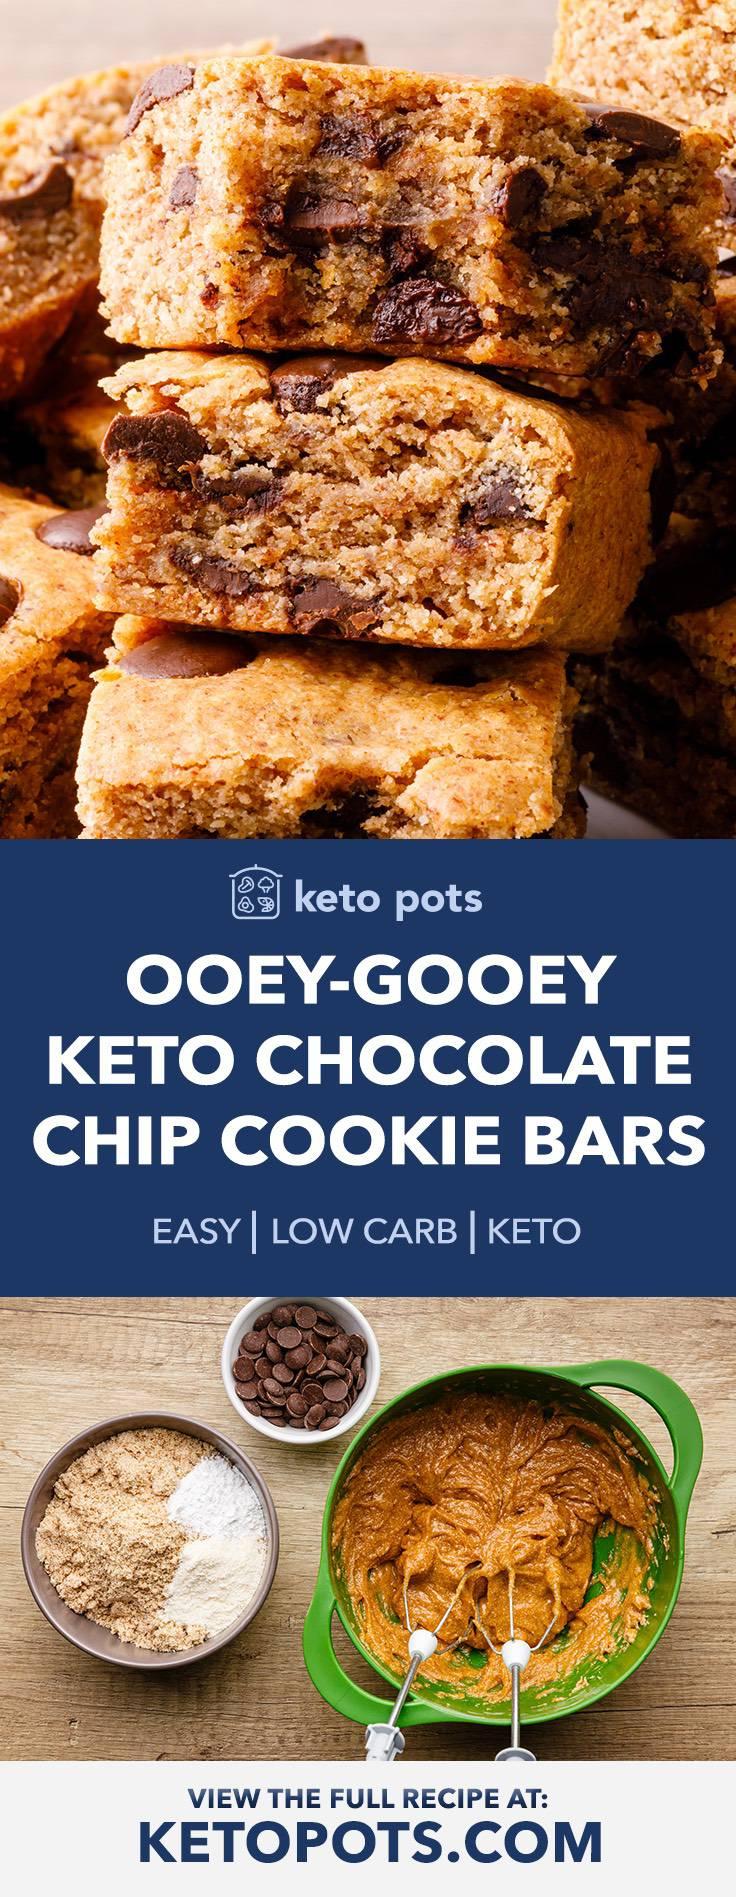 Ooey-Gooey Keto Chocolate Chip Cookie Bars